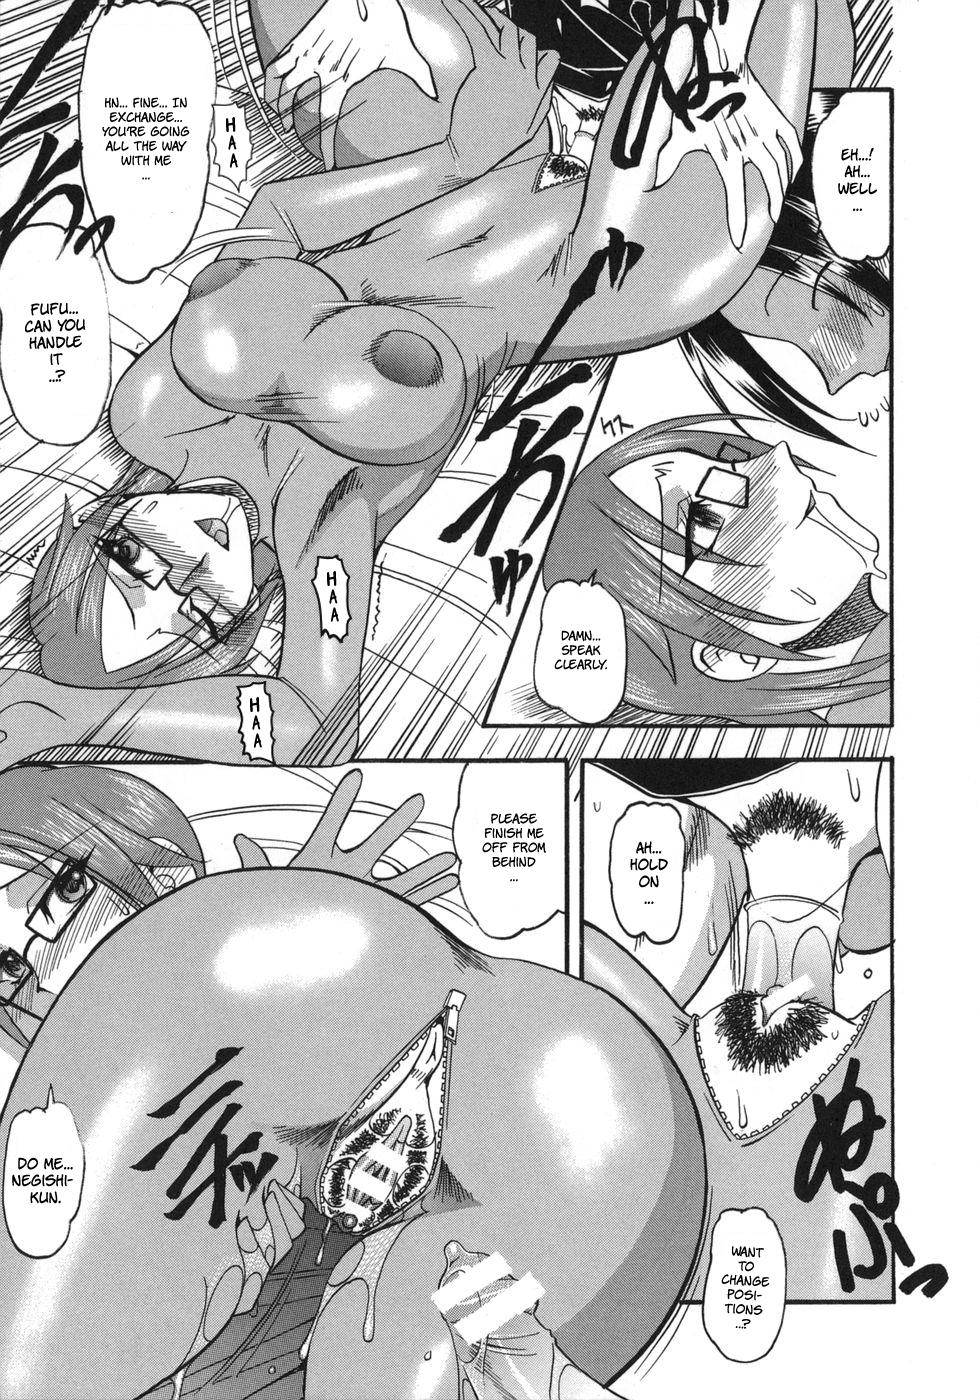 Hadaka Yori Hiwai - She is dirtier than nakedness 48